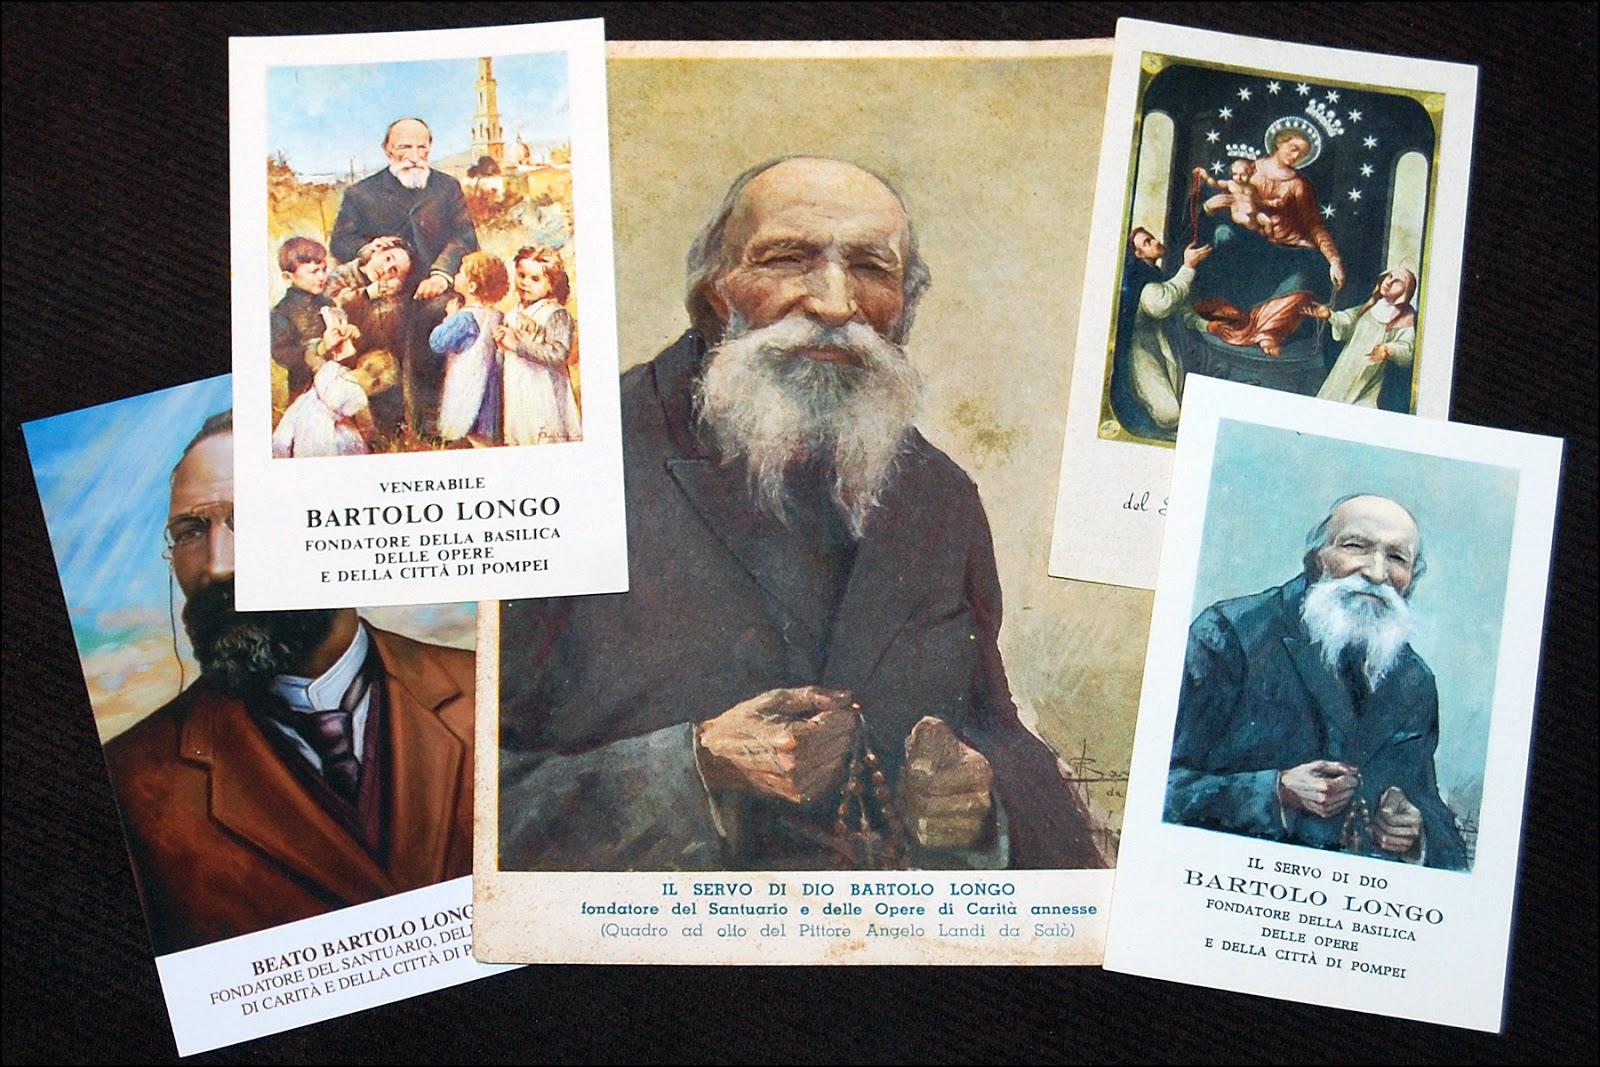 Bartolo Longo prayer cards